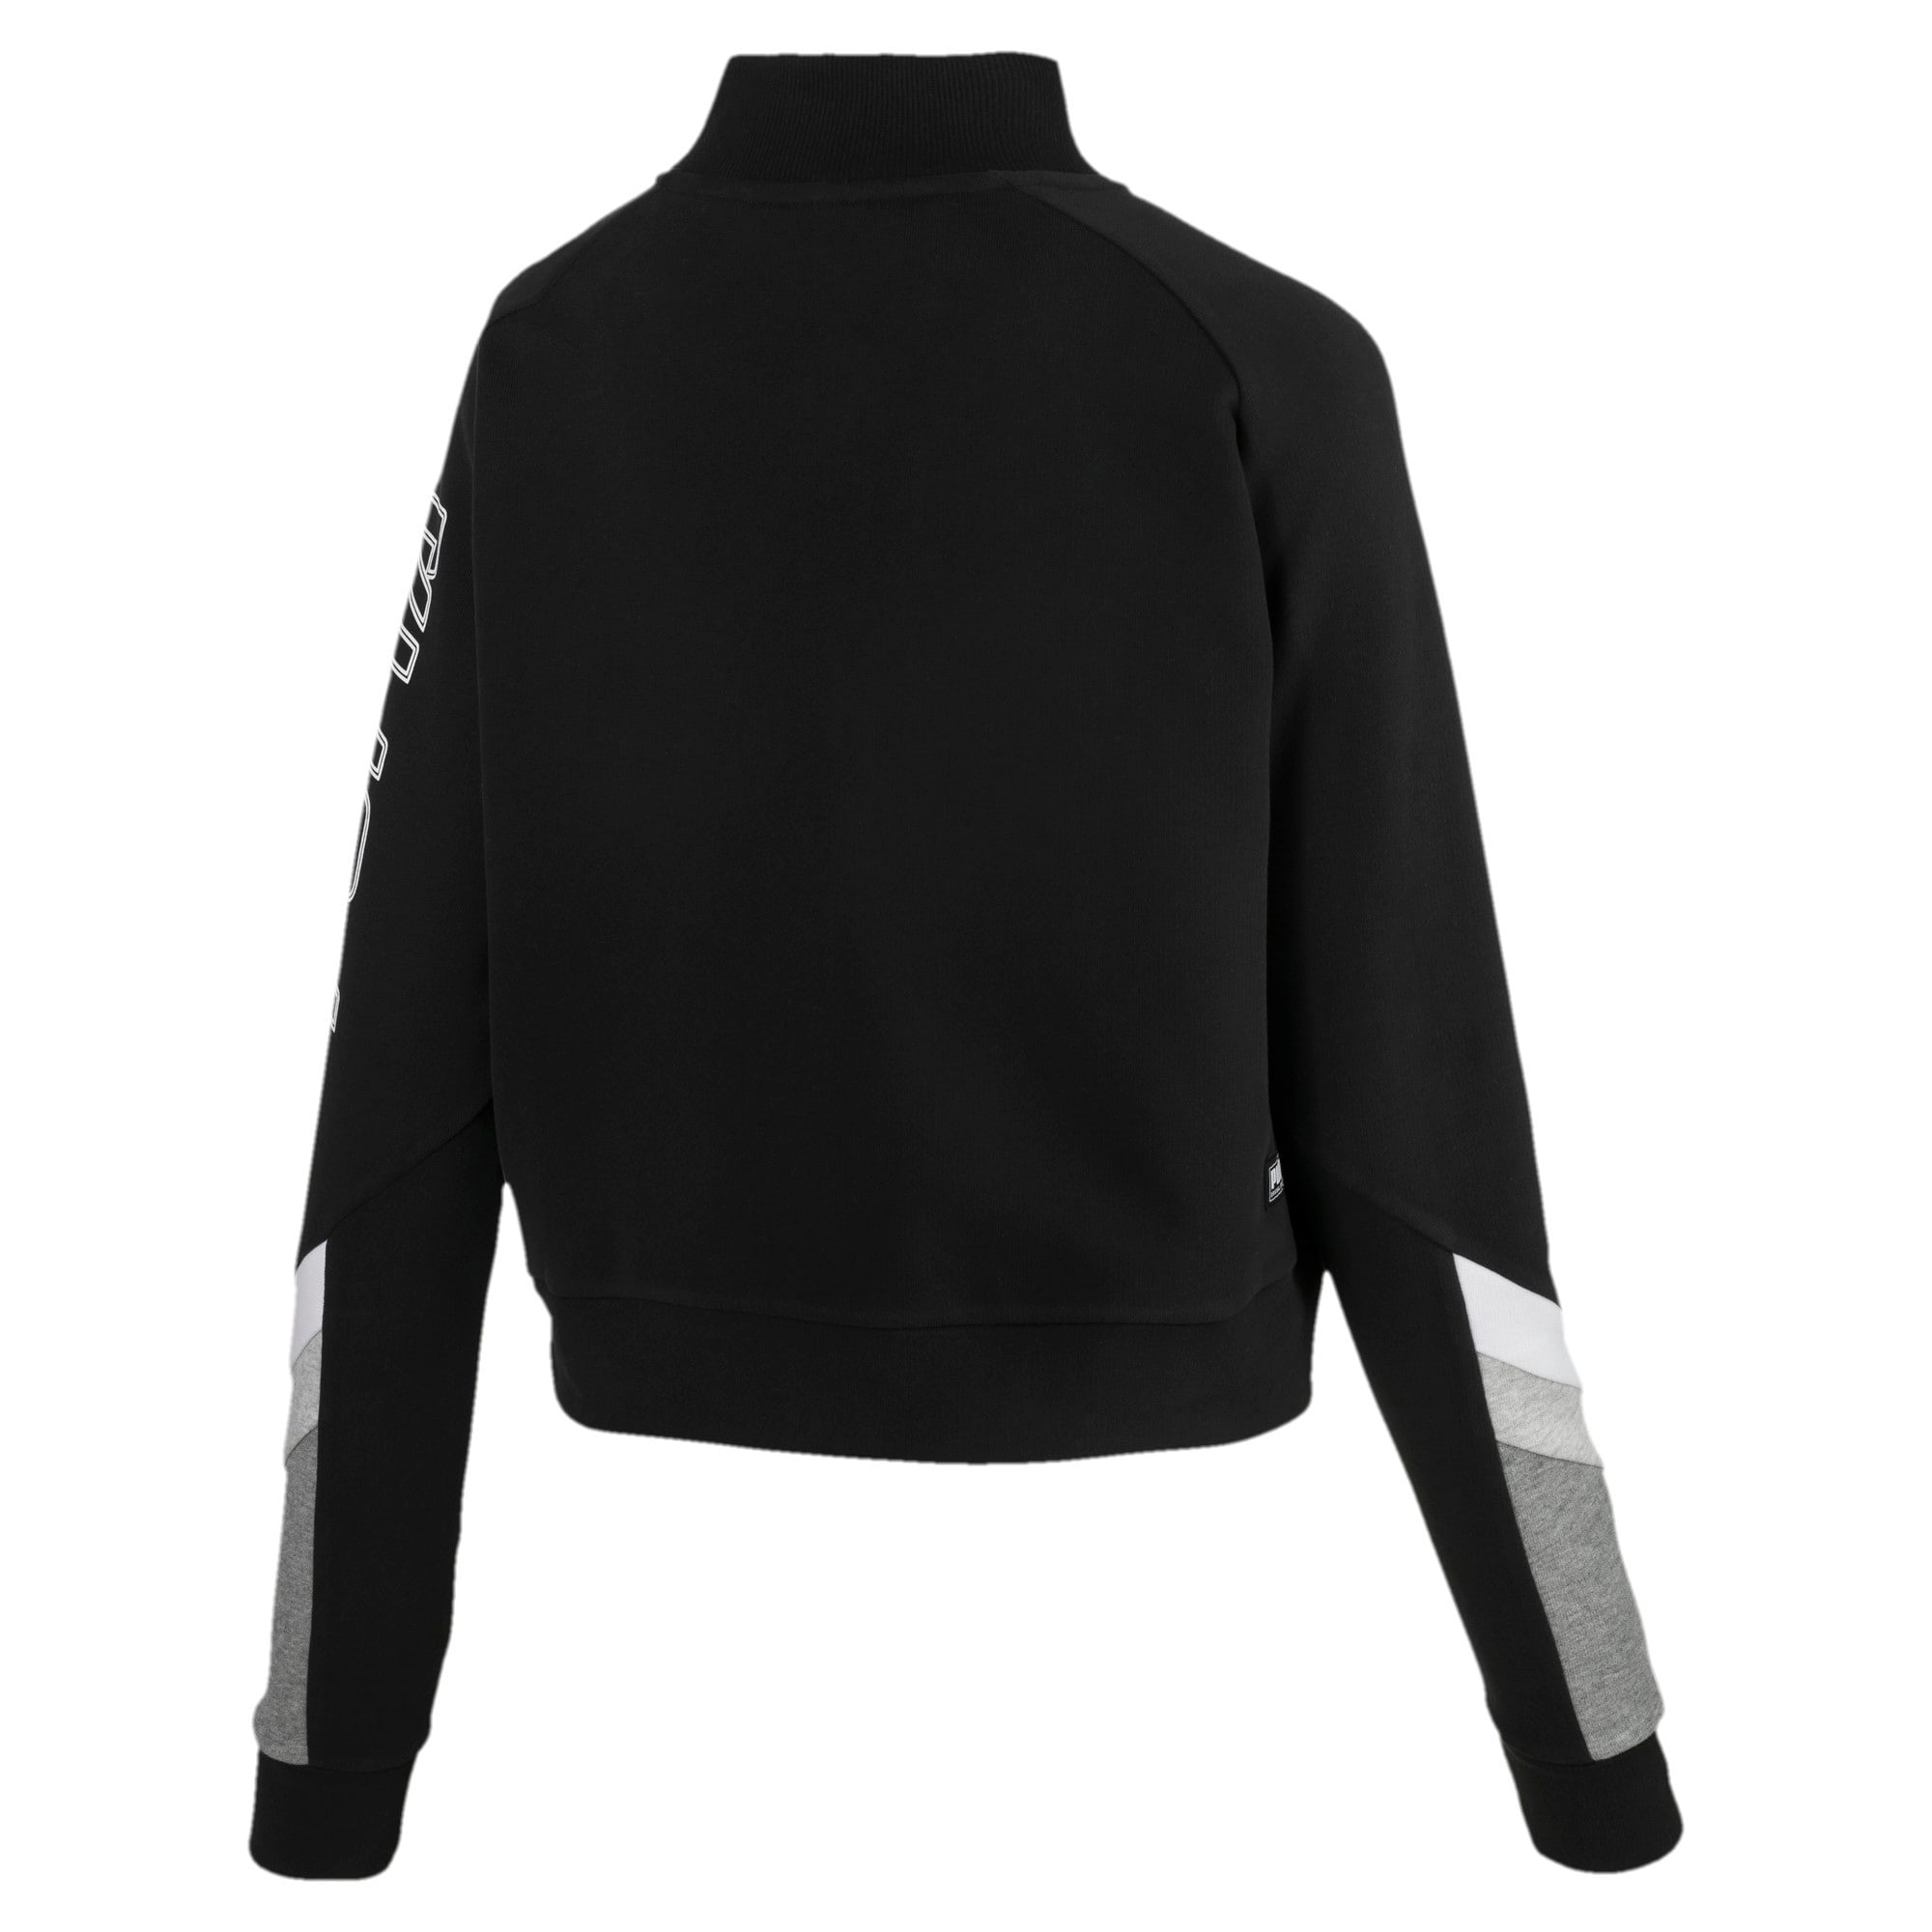 Thumbnail 5 of Athletics Bomber Jacket, Cotton Black, medium